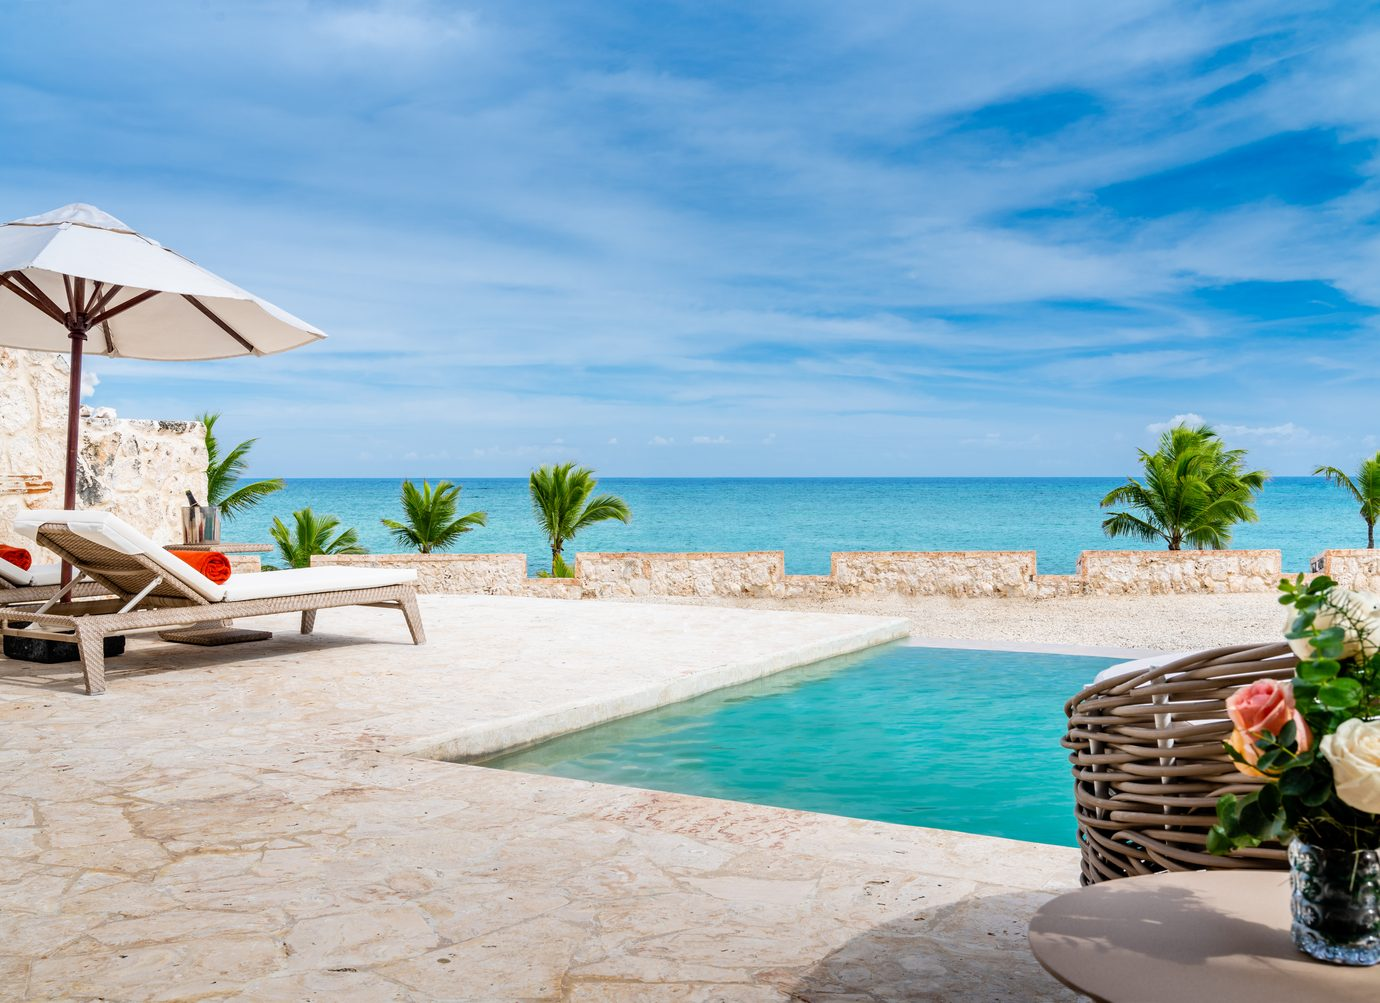 honeymooners suite private pool and beach